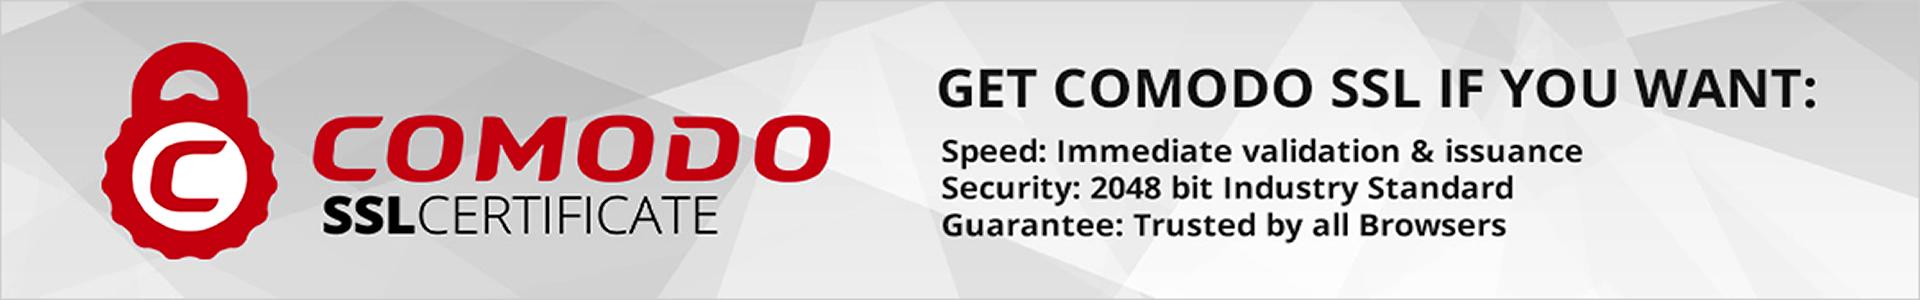 SSL Certificates - Secure your website using Comodo digital. Combo SSL